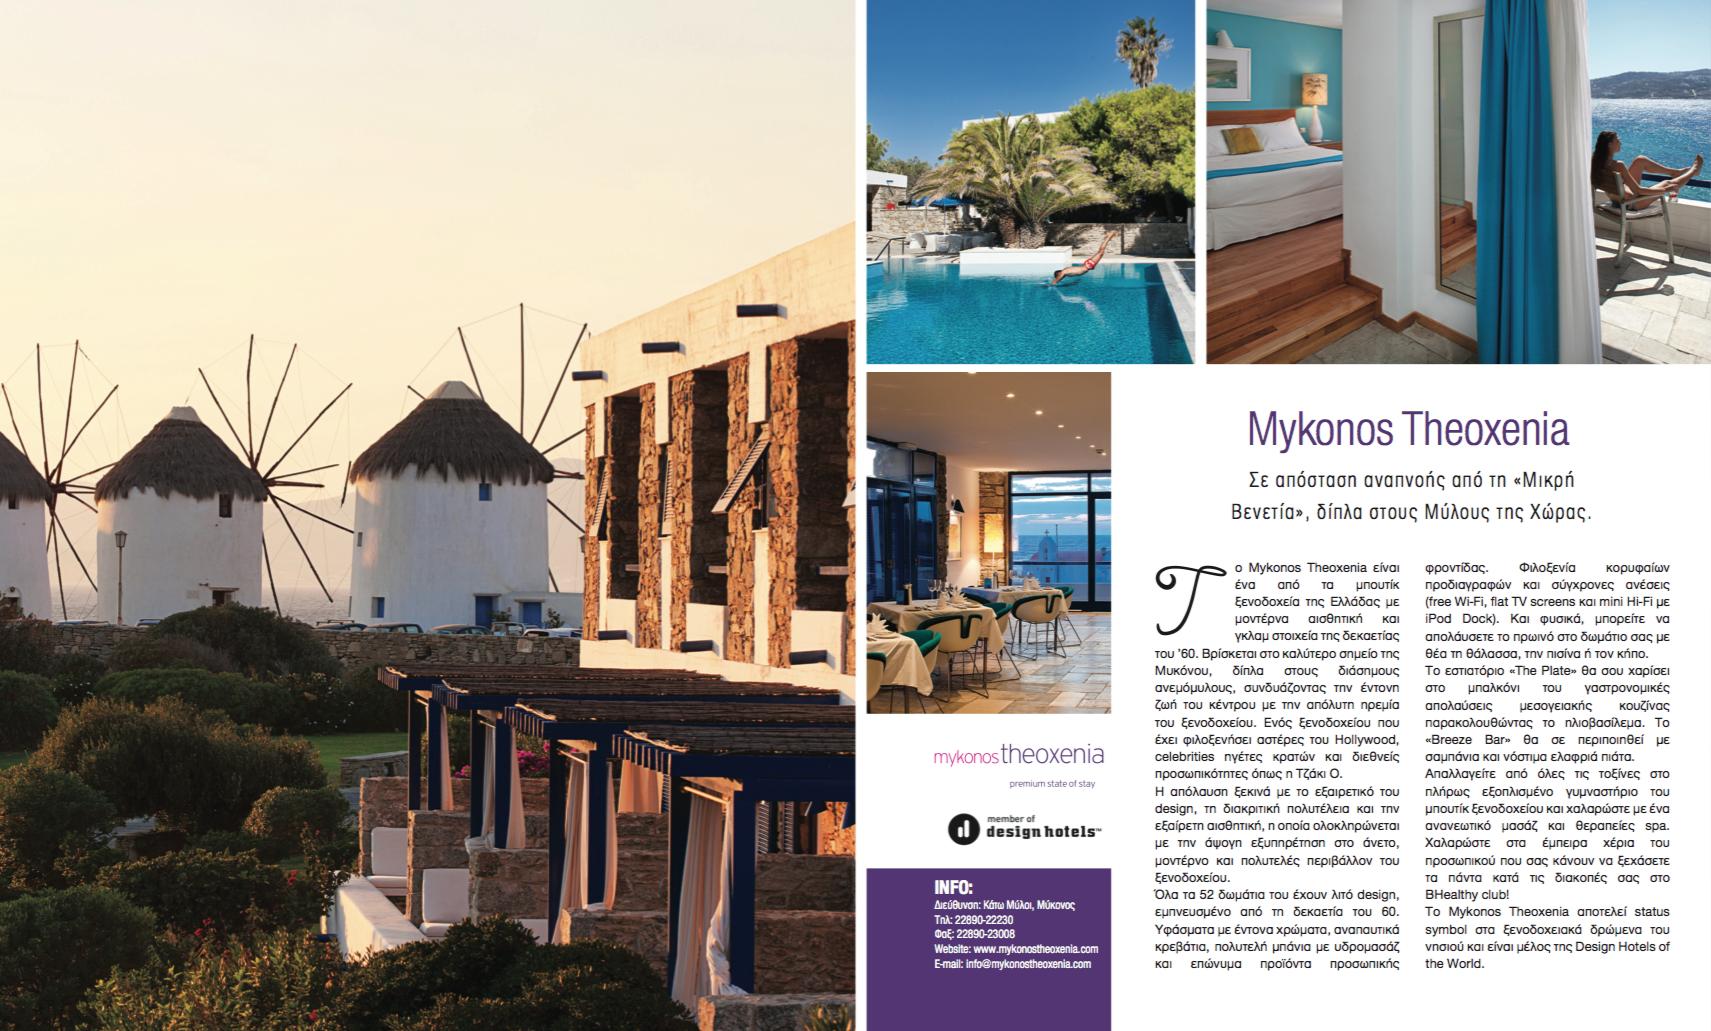 Mykonos Theoxenia Magazine Advert